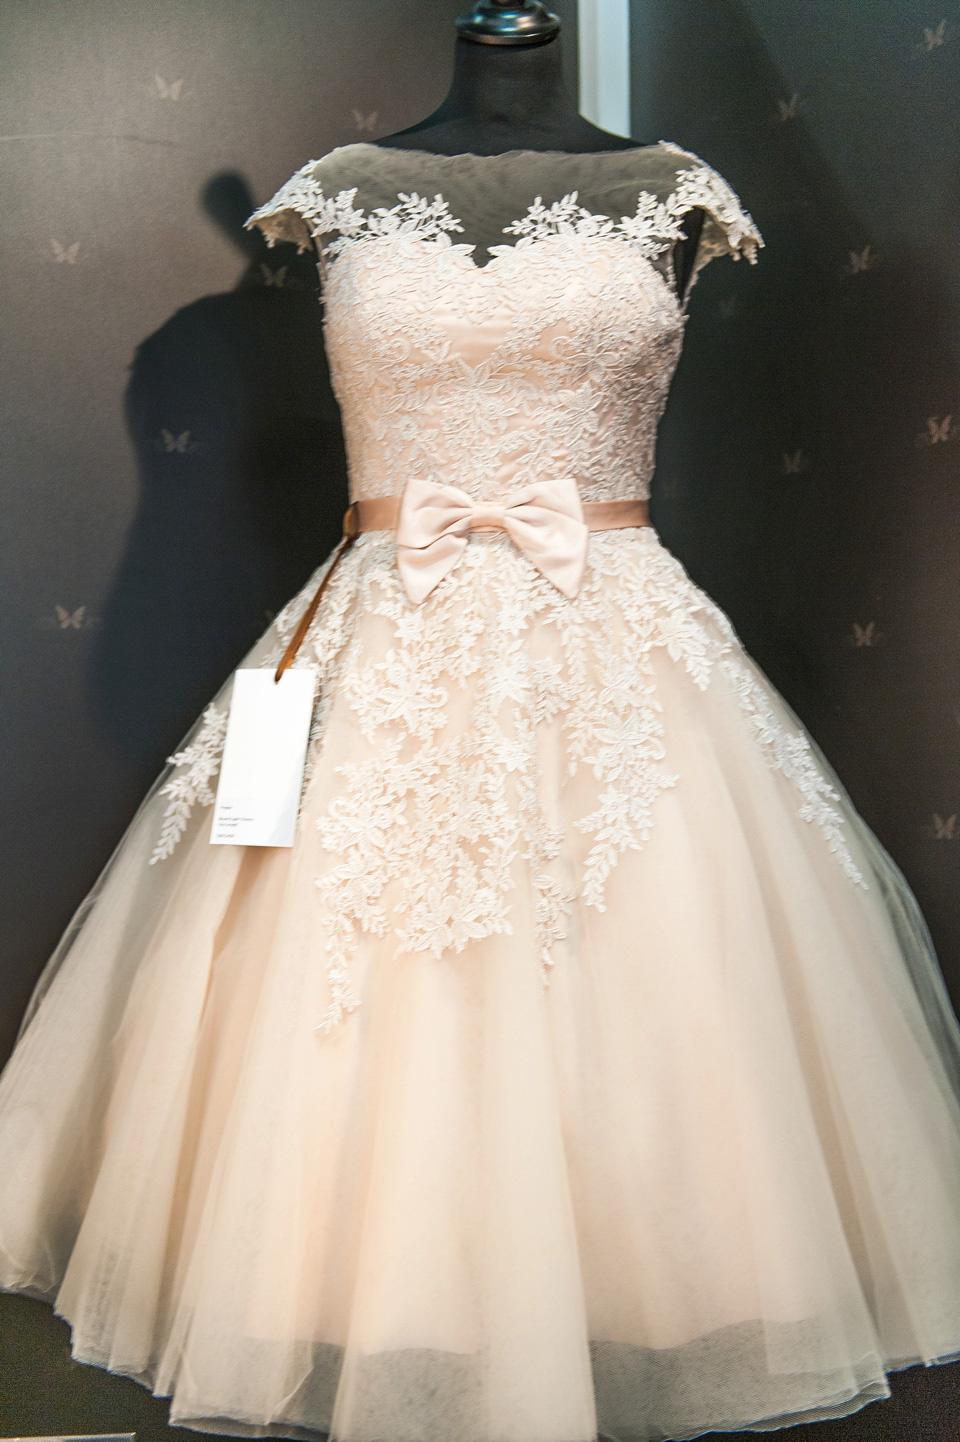 The white gallery 2015 love my dress uk wedding blog for Wedding dress material online